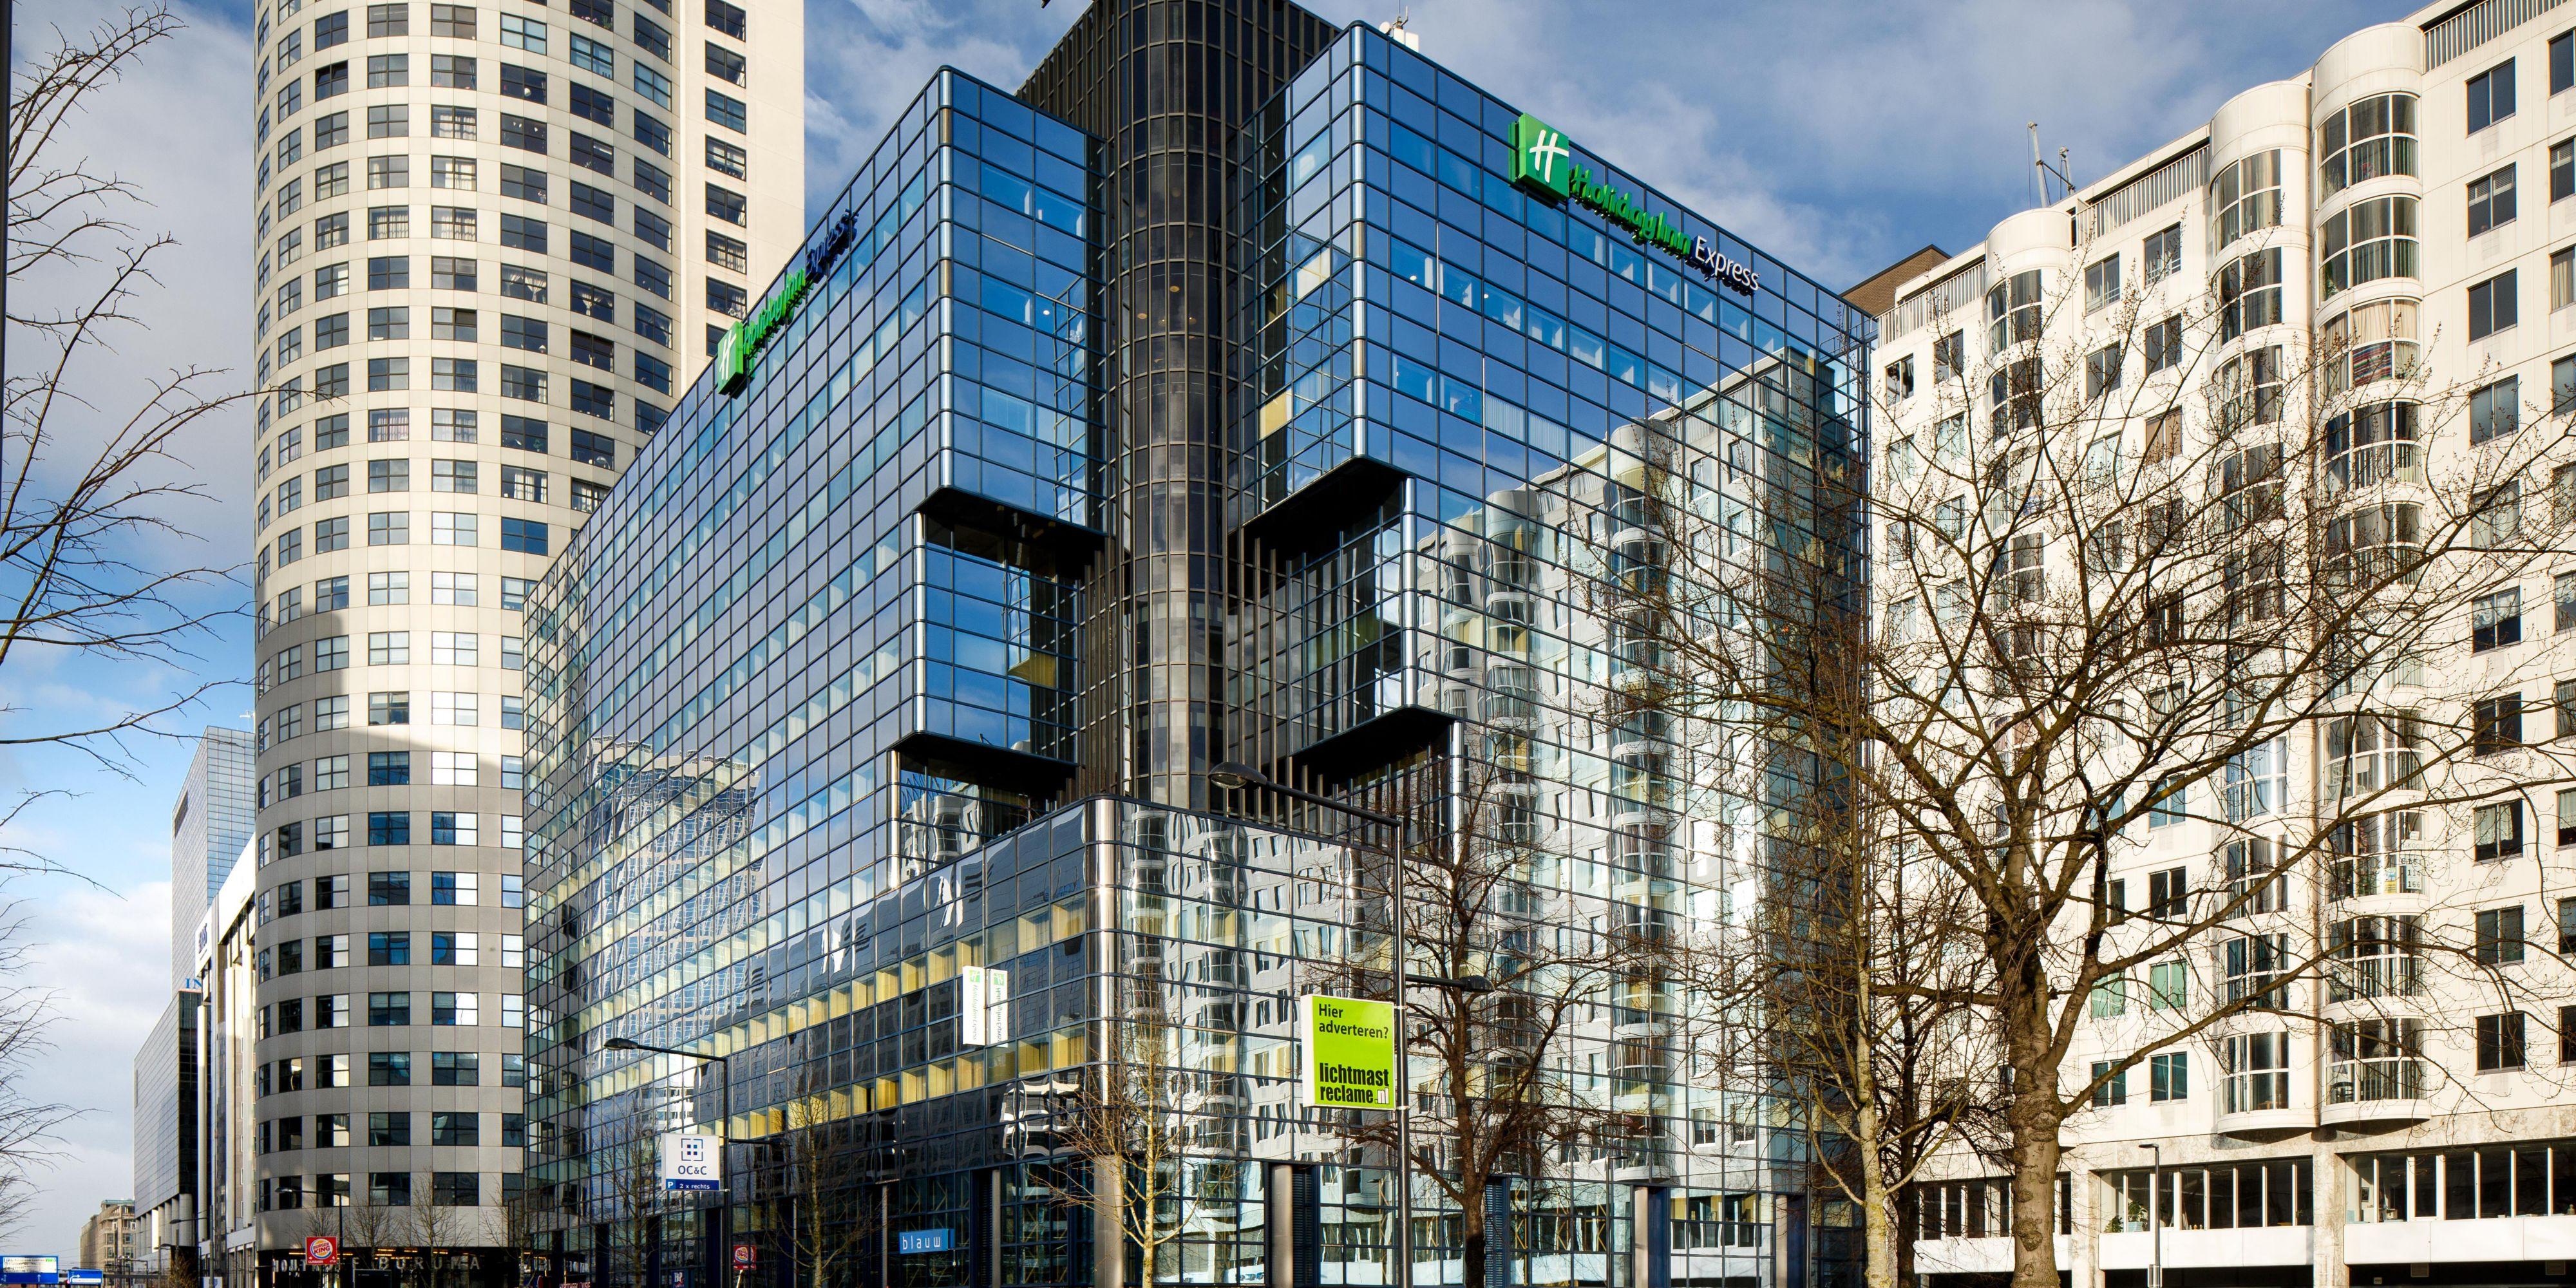 Rotterdam dating service